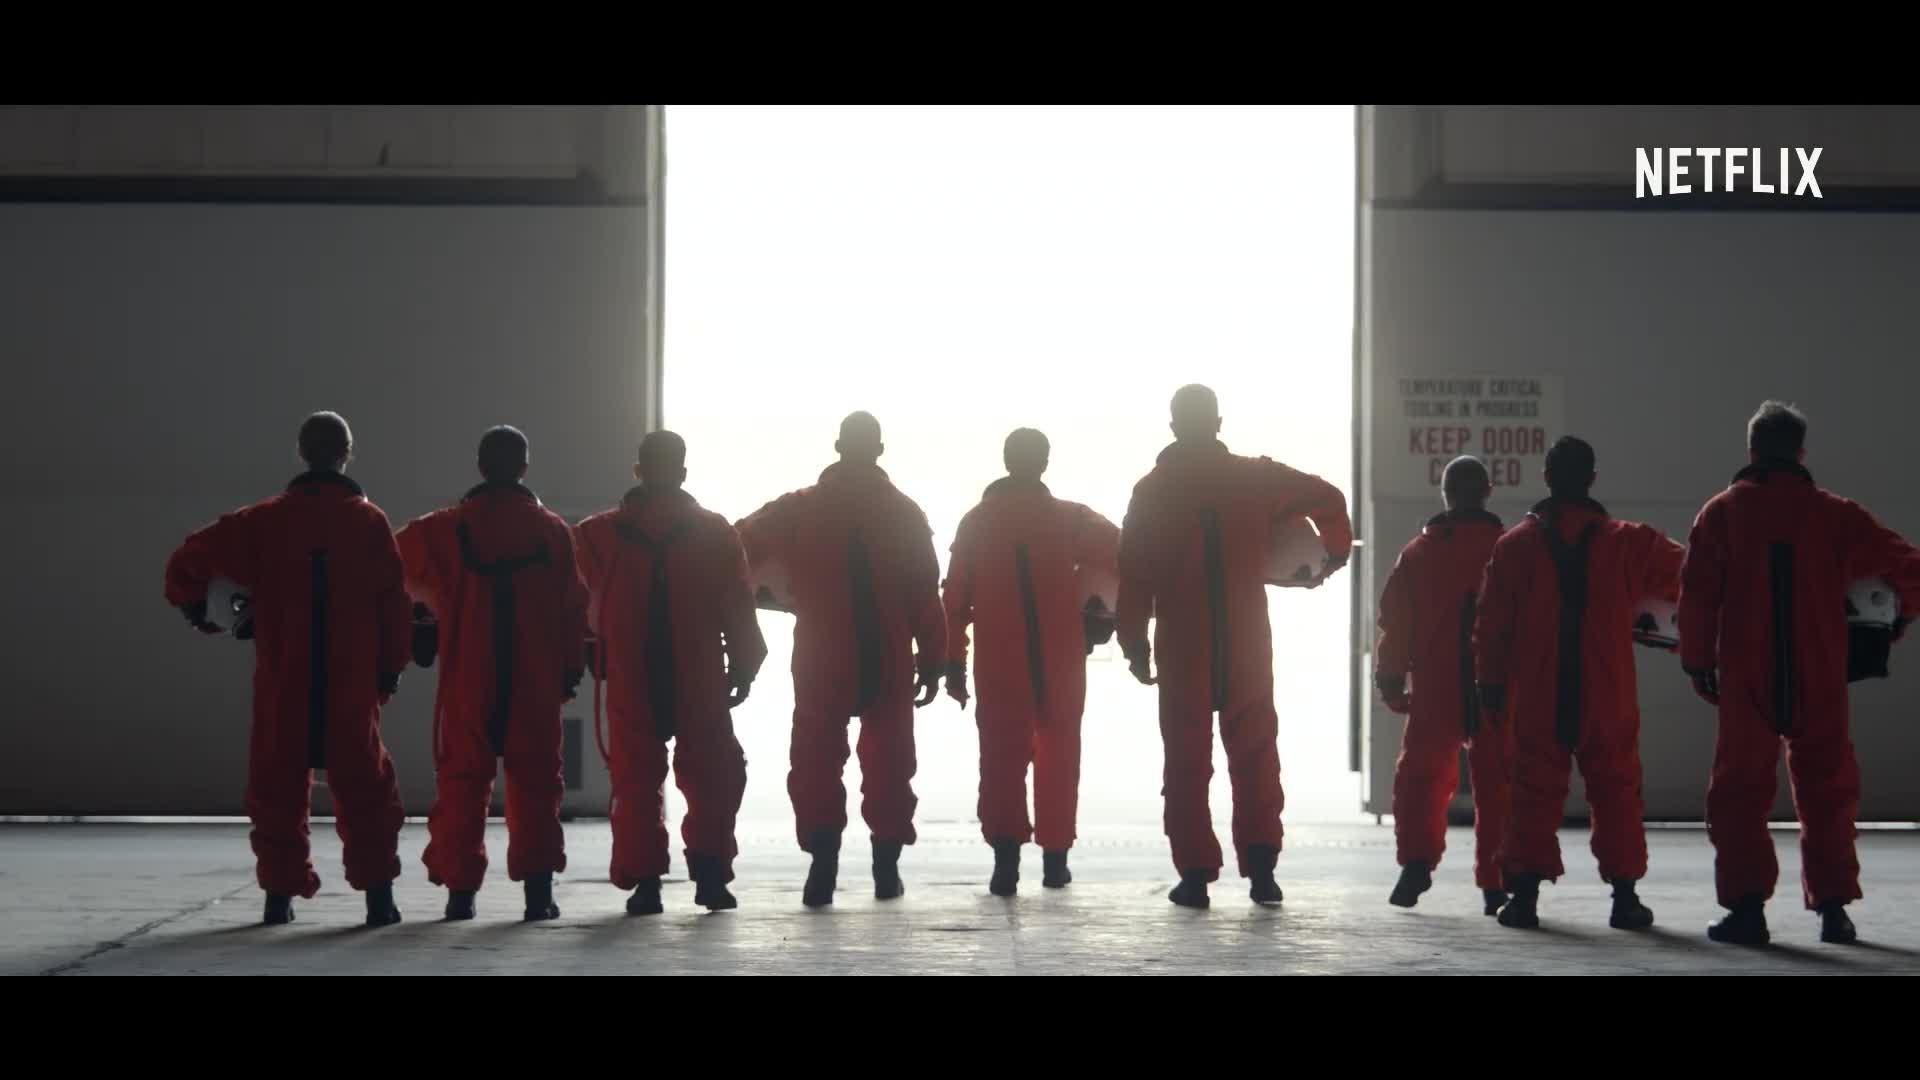 Trailer, Netflix, Serie, Comedy, Space Force, Steve Carell